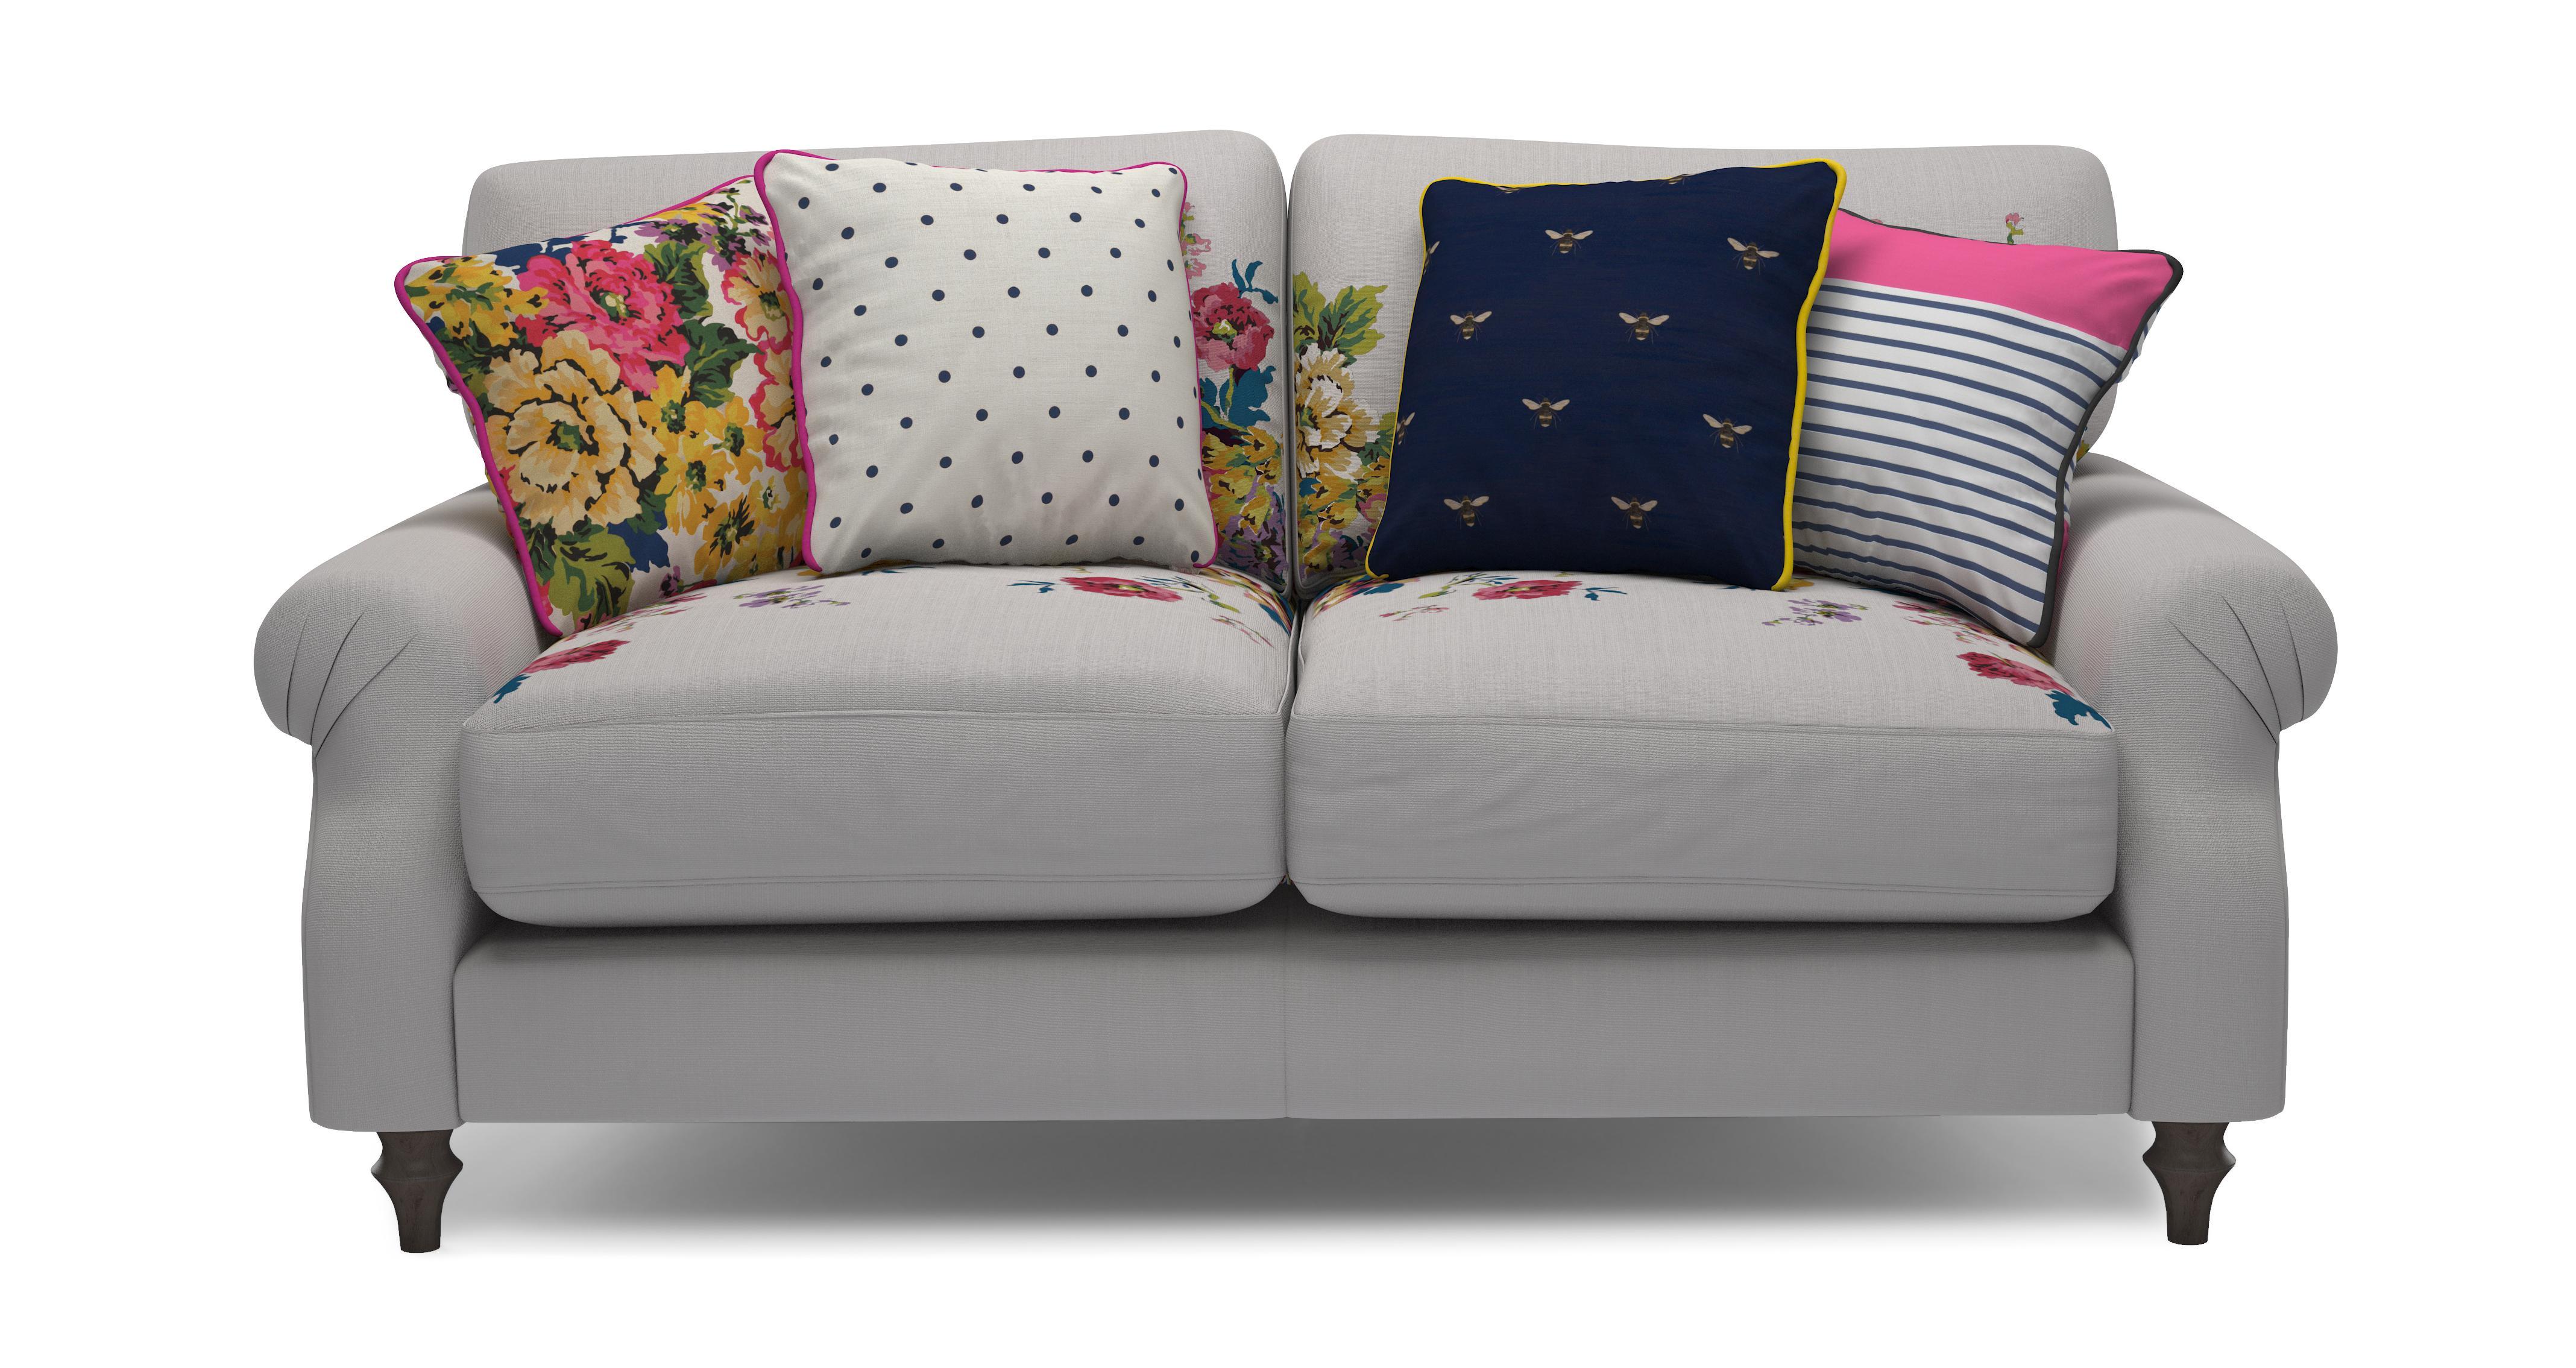 GXD Cambridge Cotton 2 Seater Sofa Joules